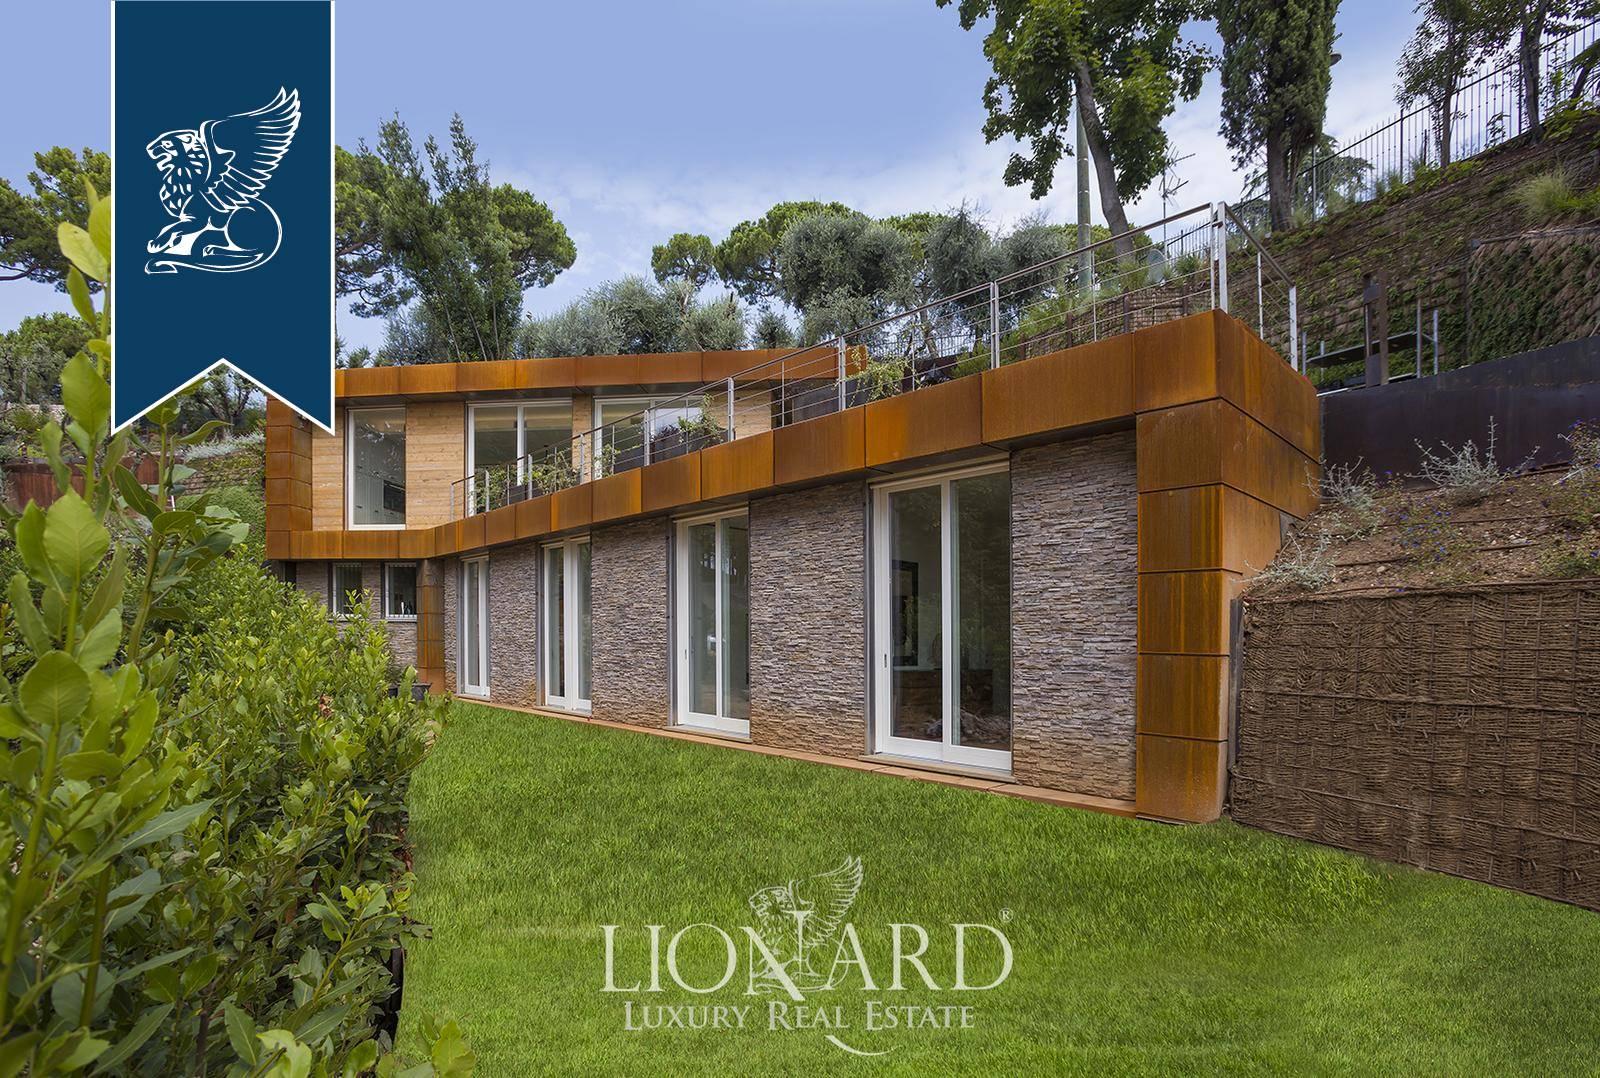 Villa in Vendita a Padenghe Sul Garda: 0 locali, 400 mq - Foto 1